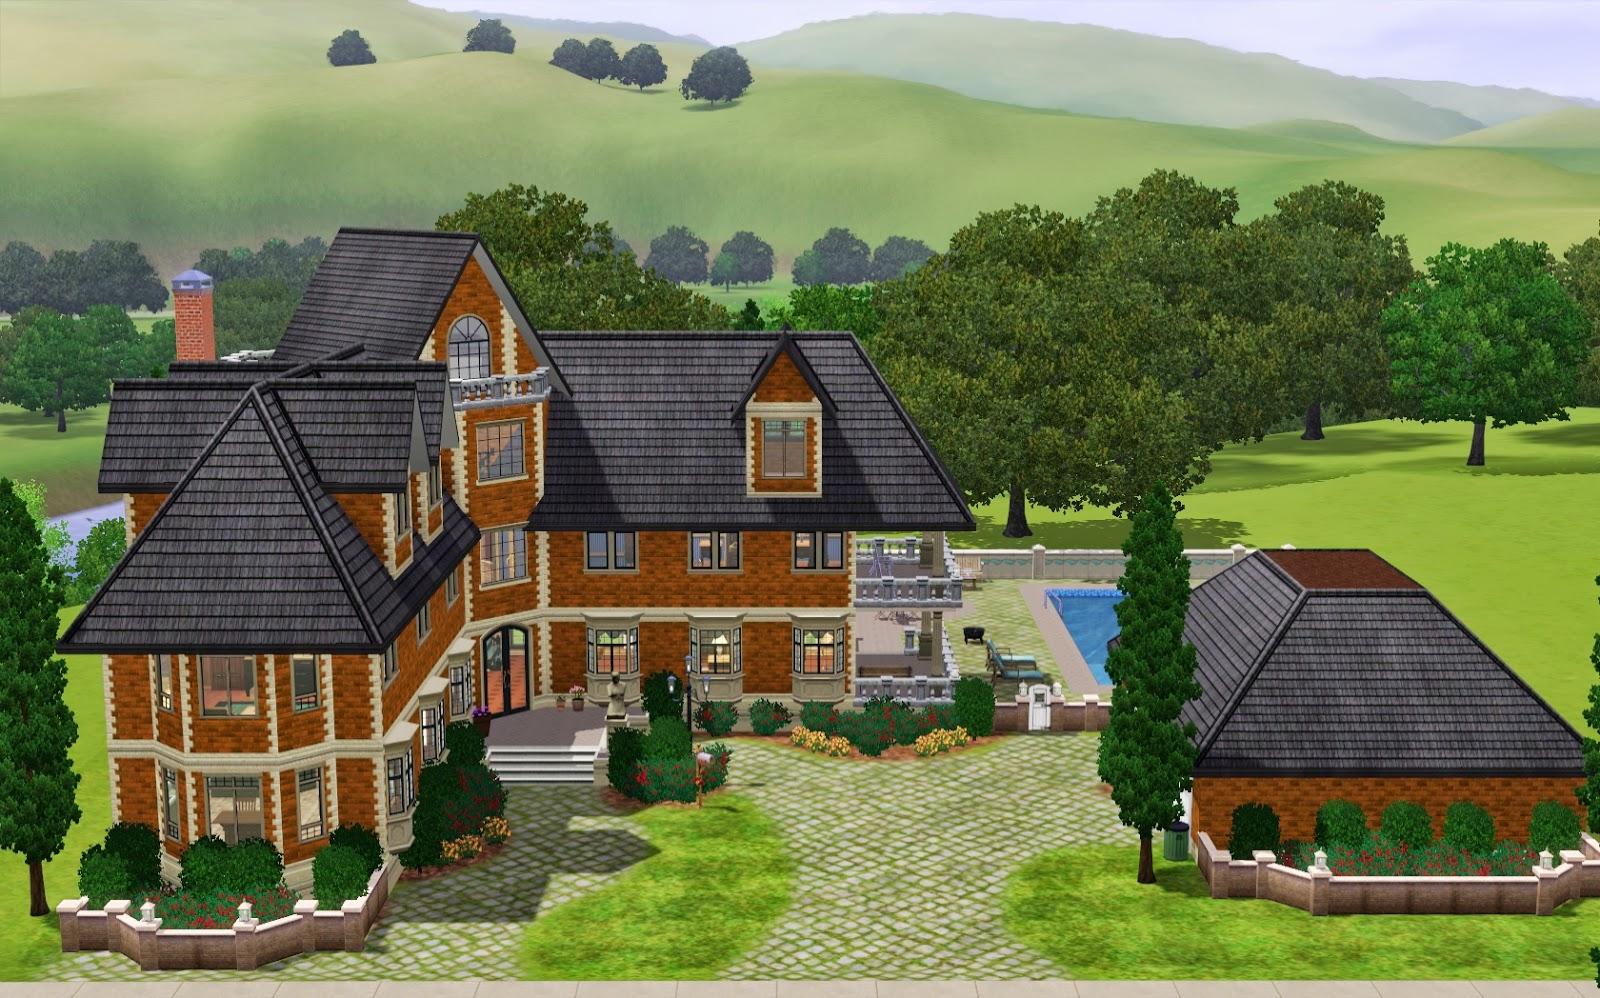 Summer S Little Sims 3 Garden Riverview List Of Houses